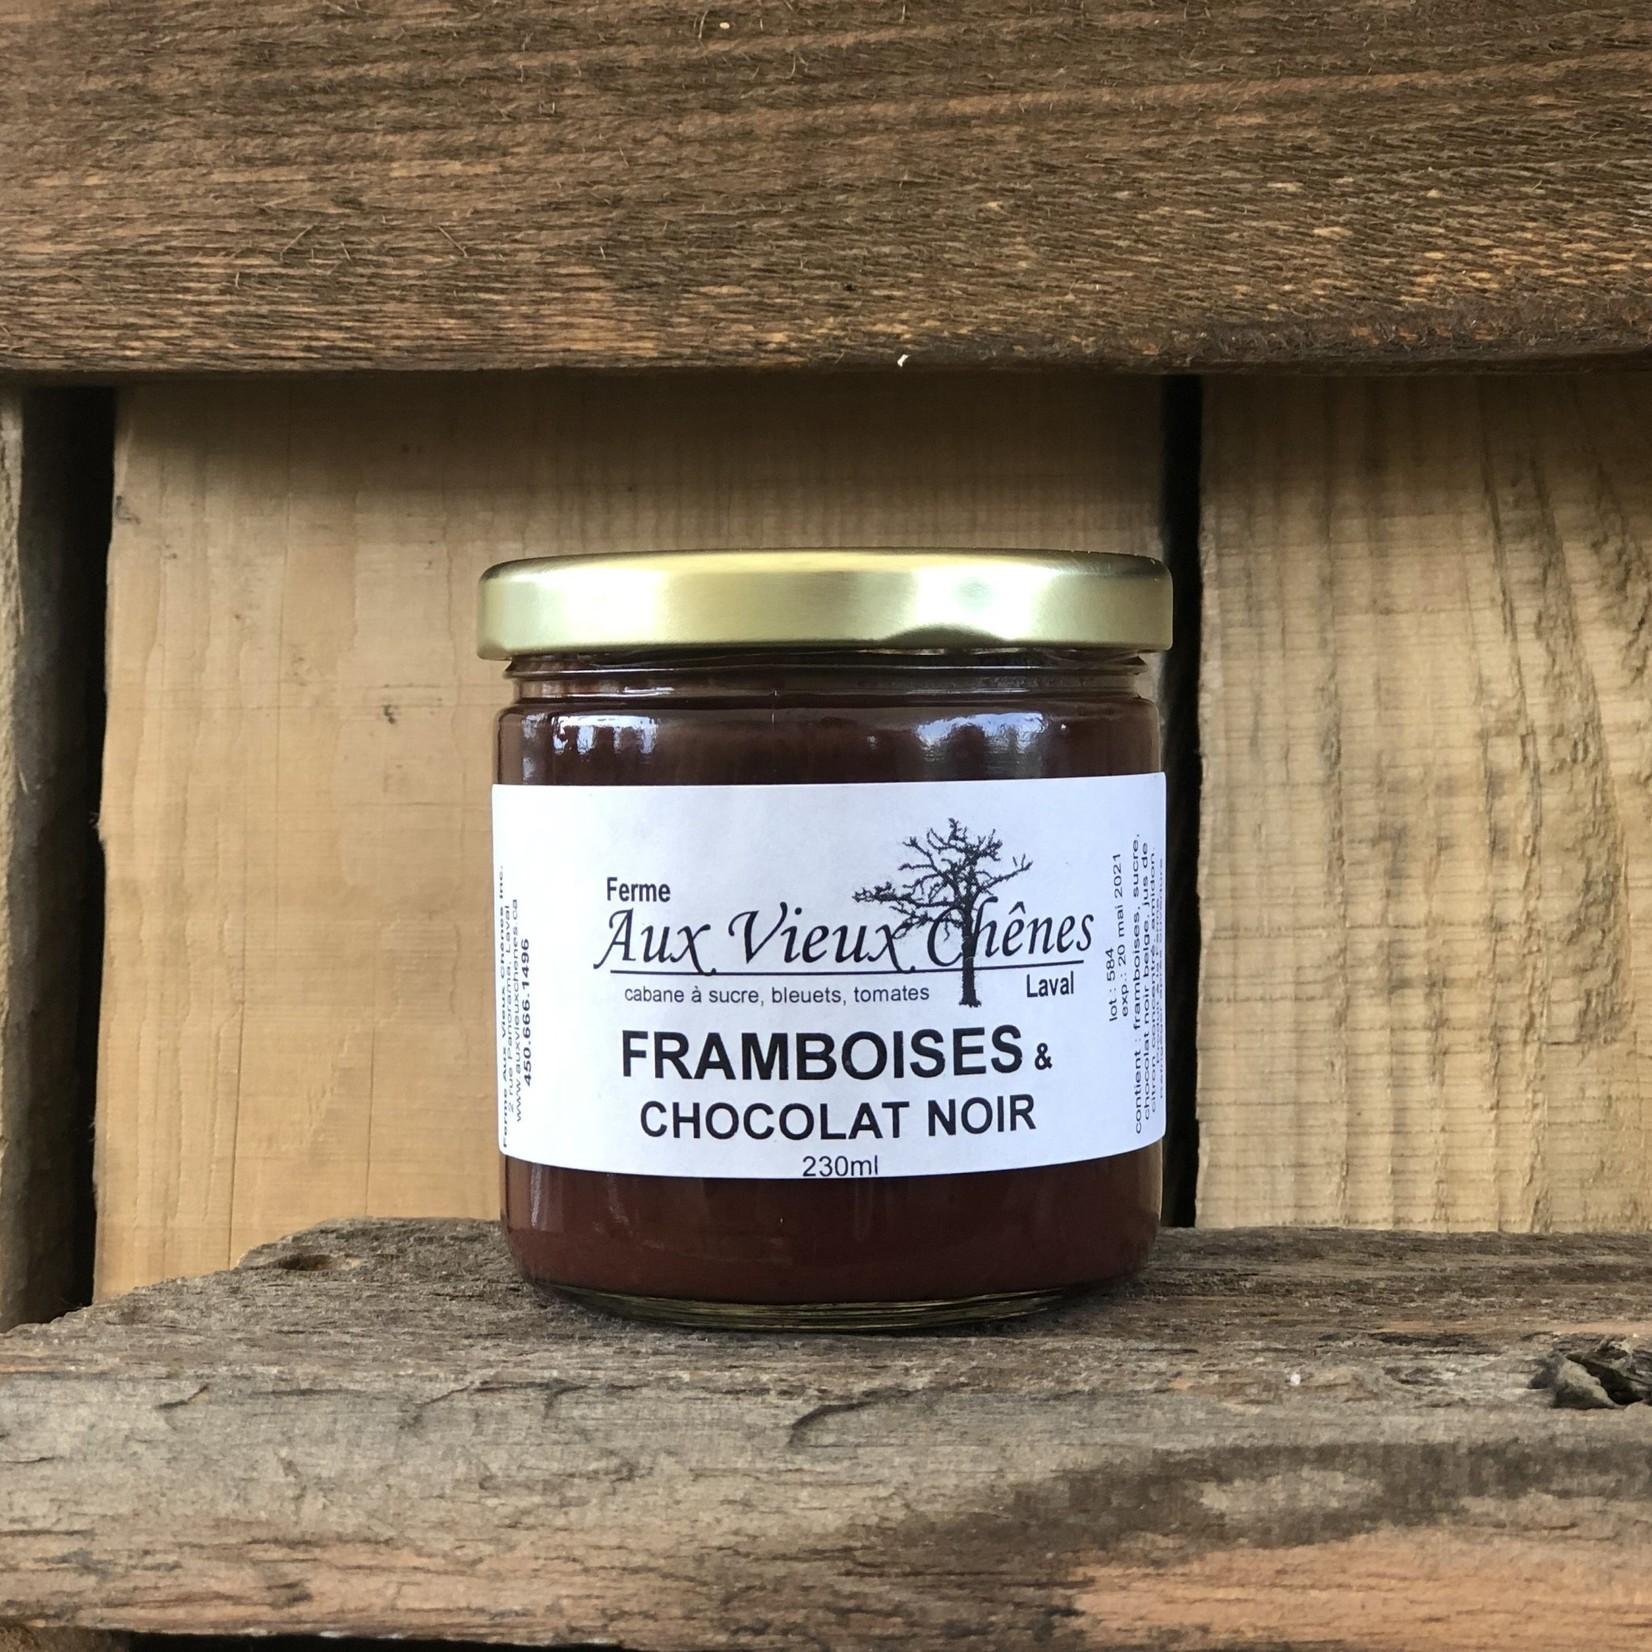 Aux Vieux Chênes Tartinade Framboise & Chocolat Noir